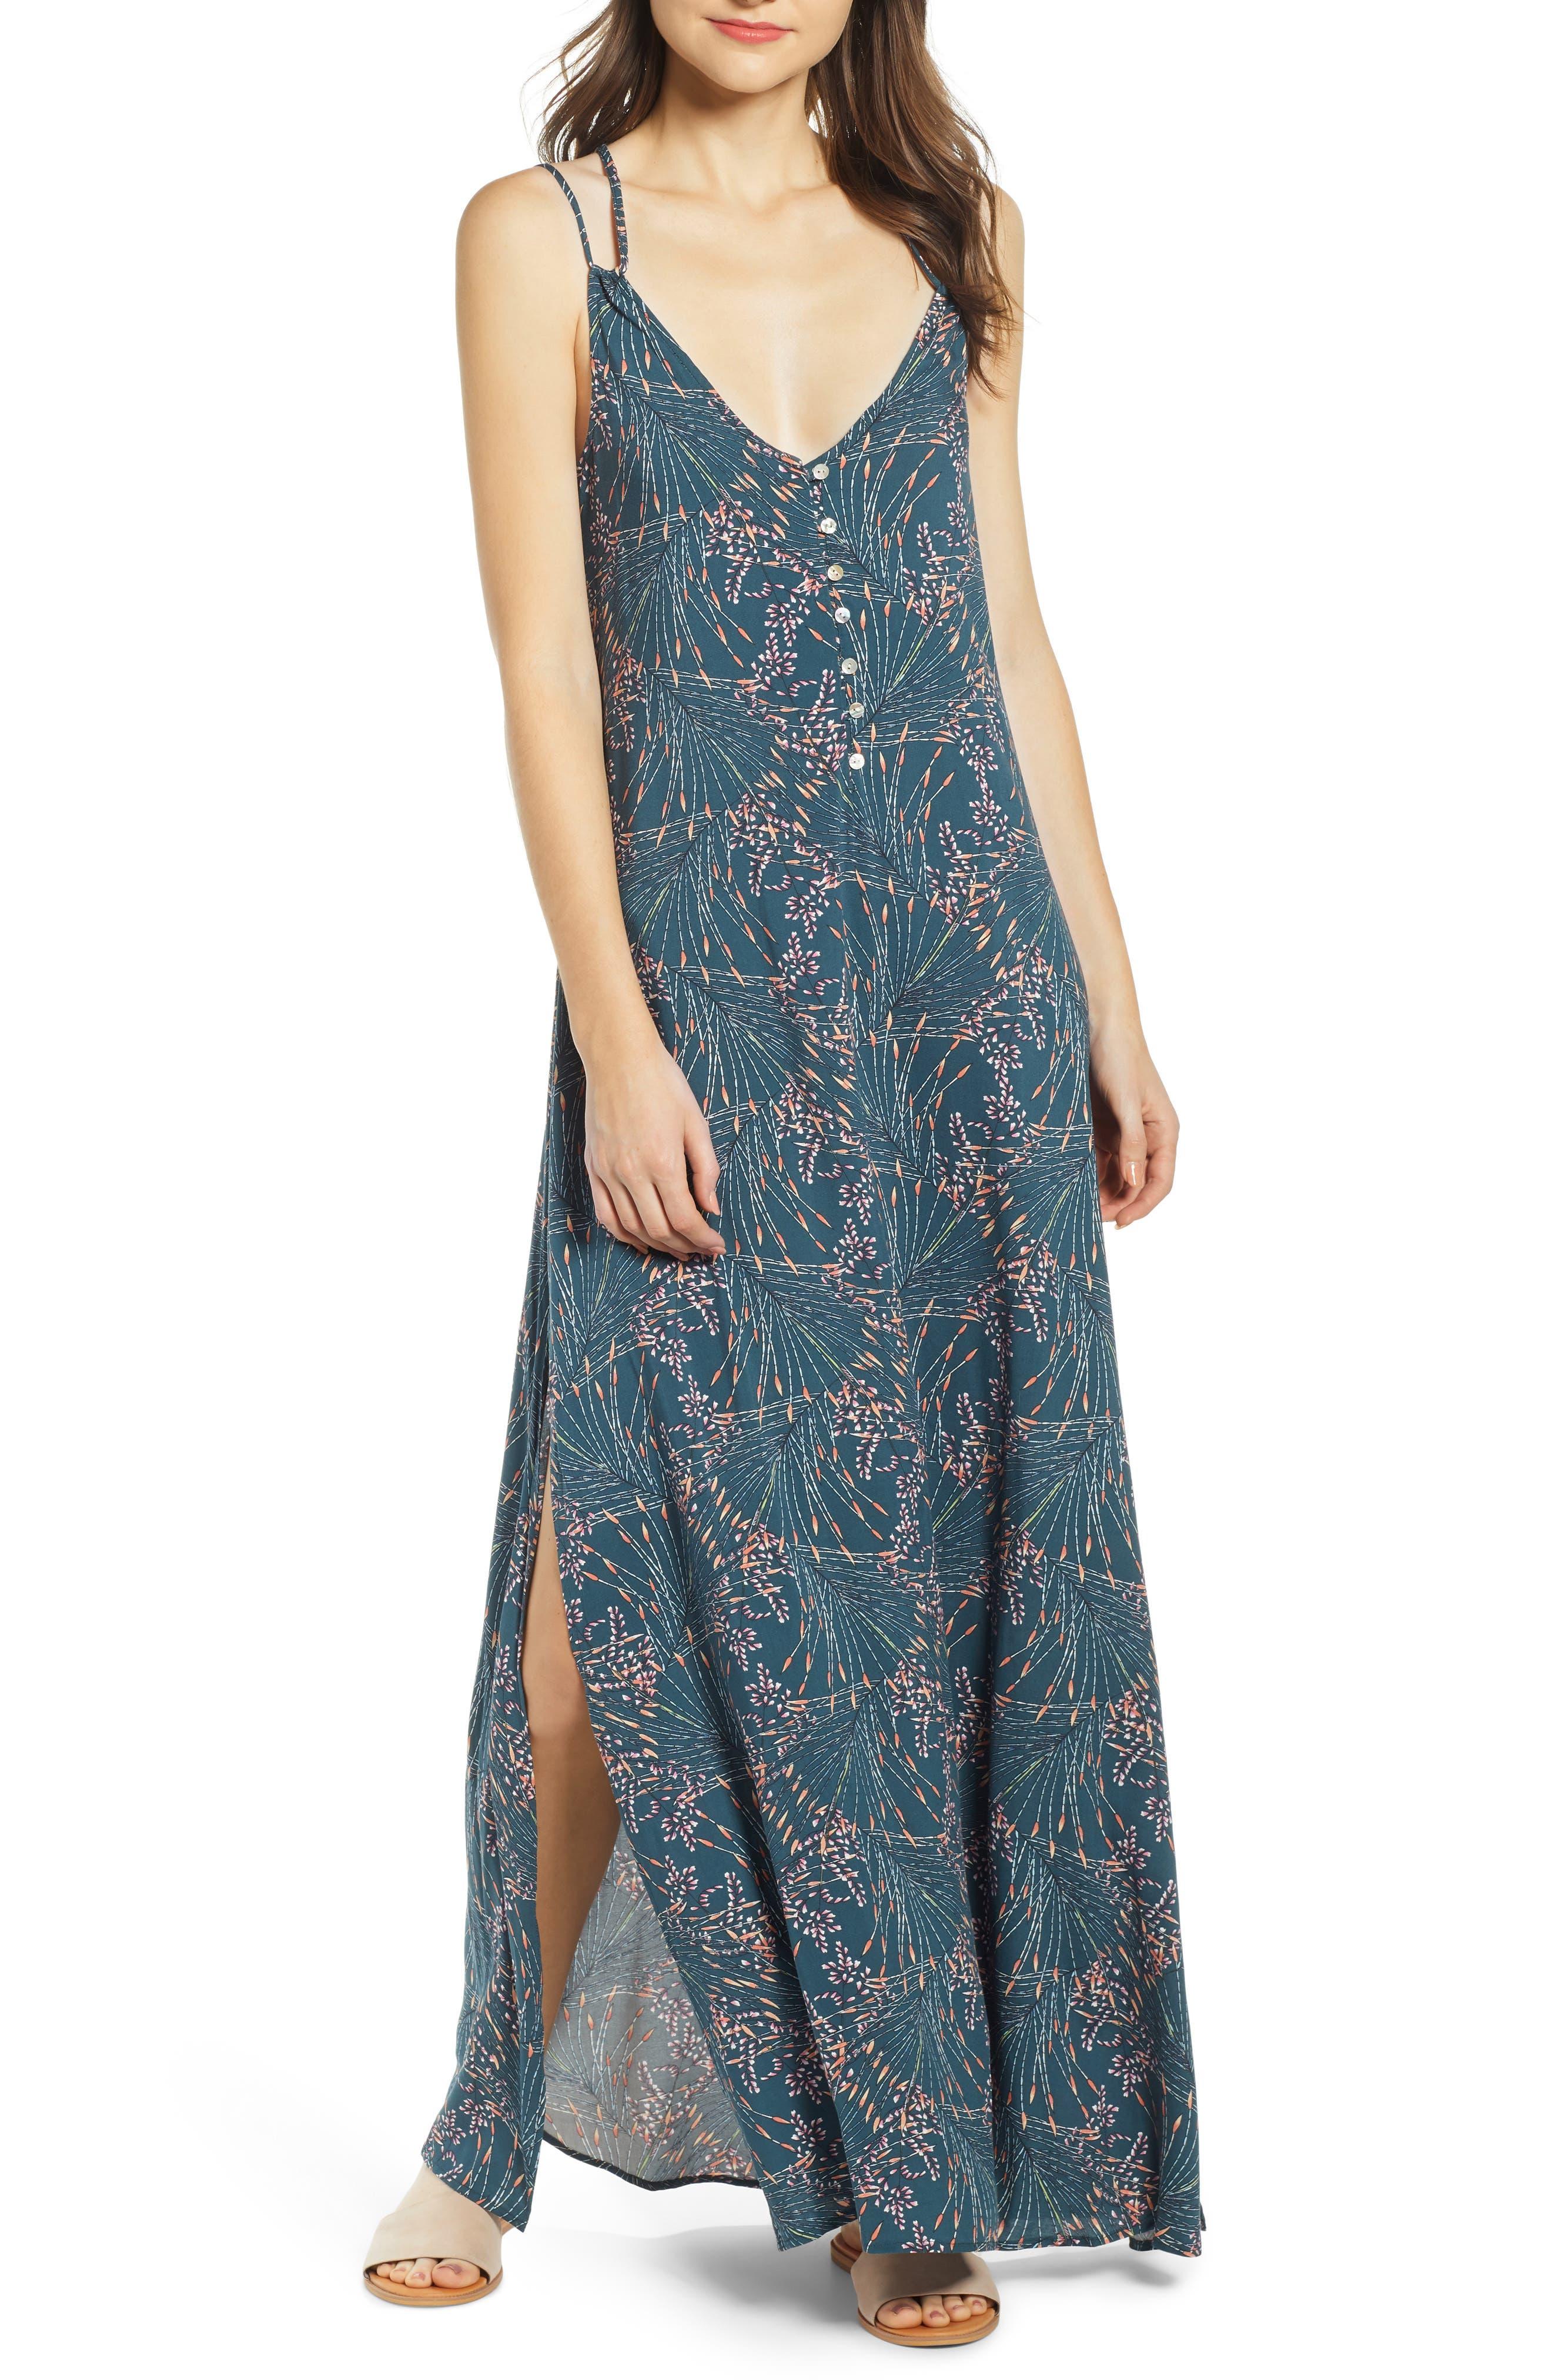 O'NEILL,                             Breanna Maxi Dress,                             Main thumbnail 1, color,                             STARGAZER